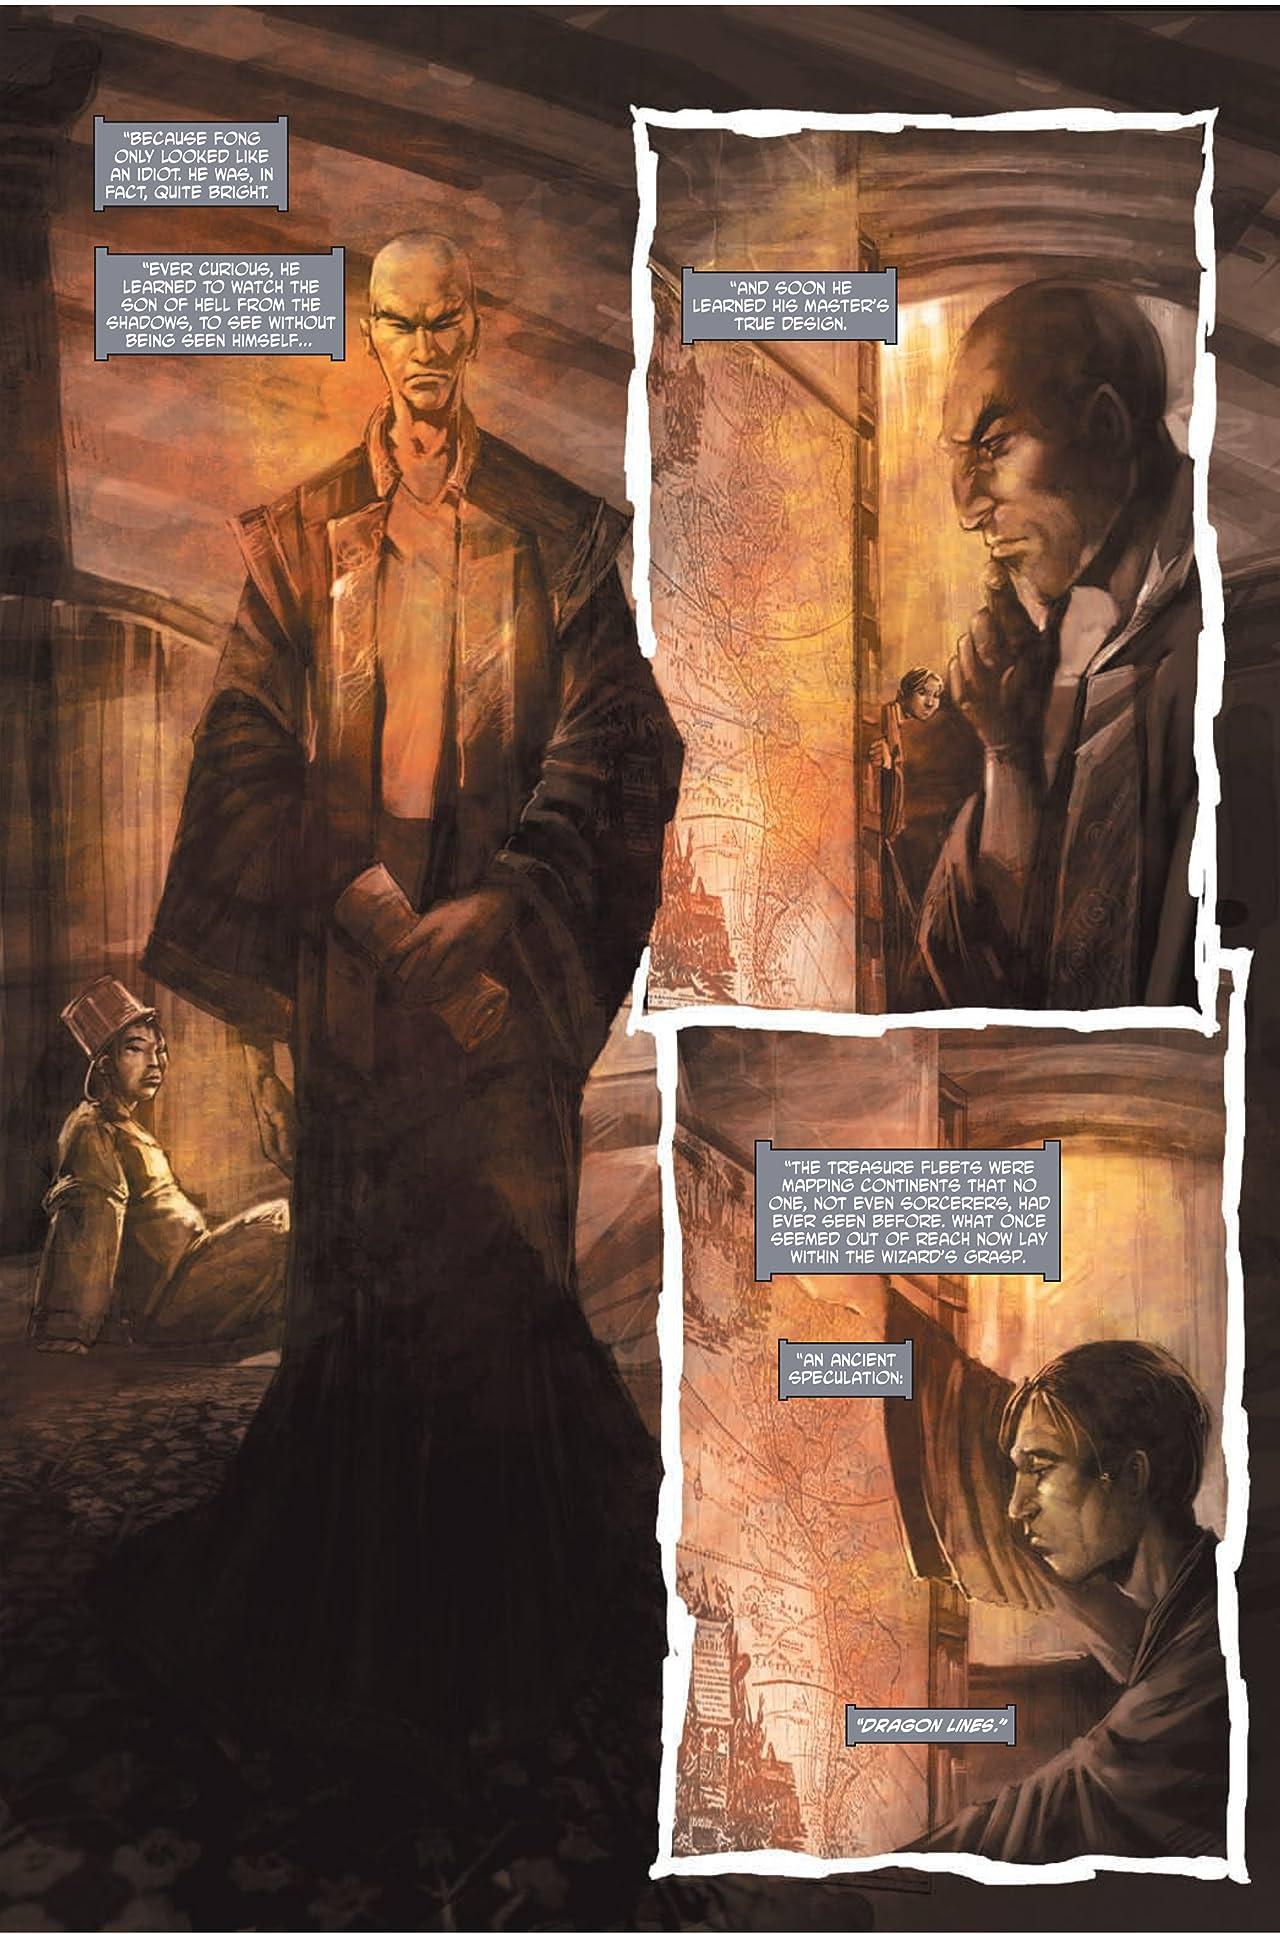 John Woo's 7 Brothers Vol. 1 #2